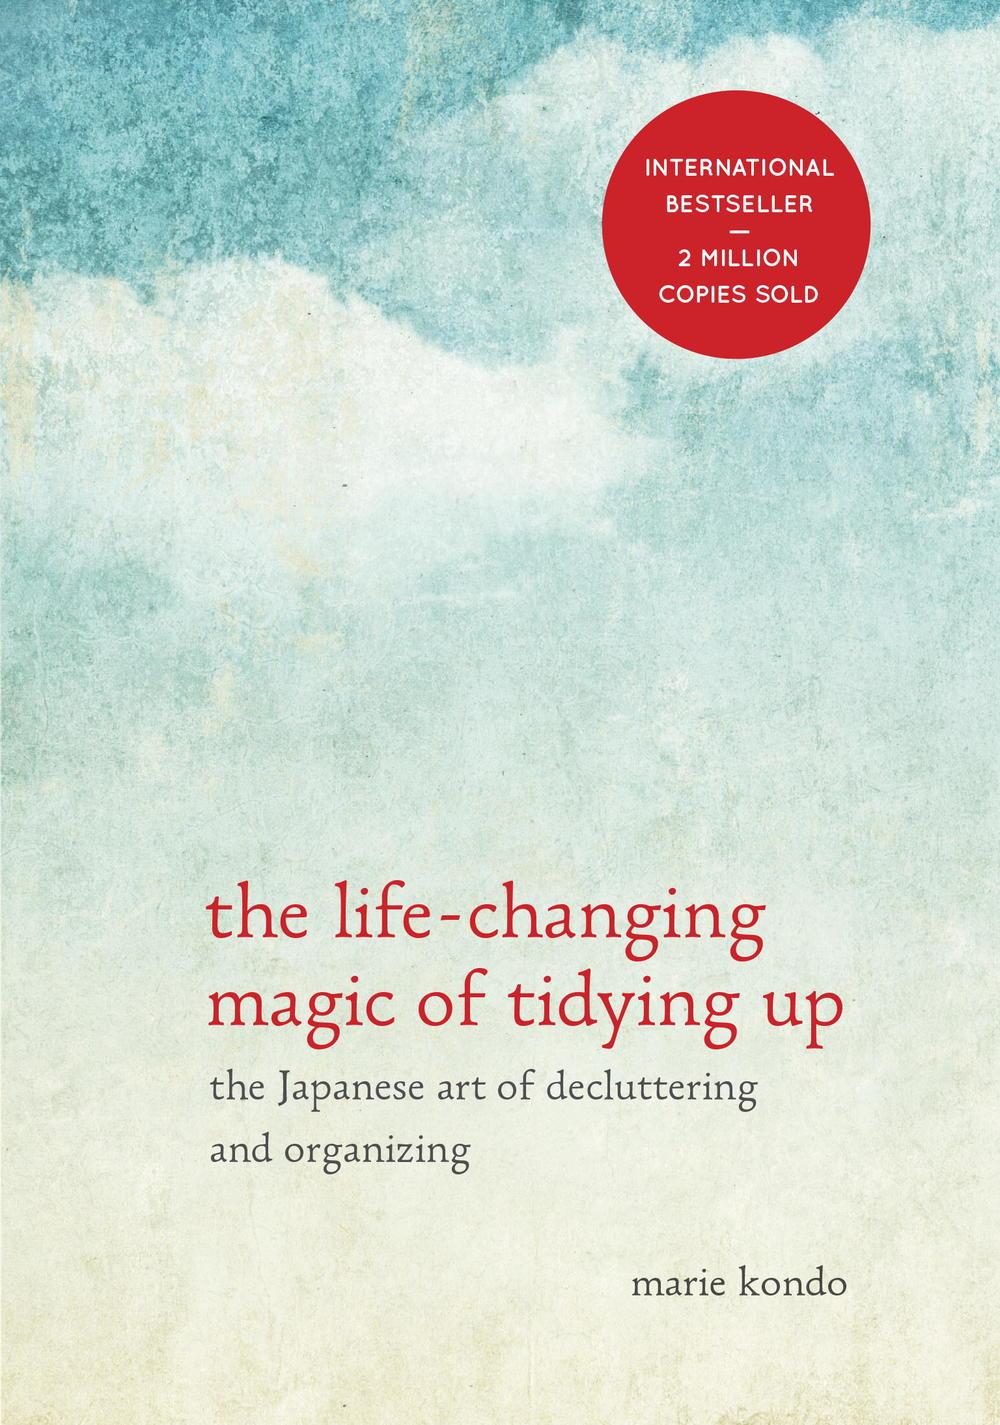 www.tidyingup.com